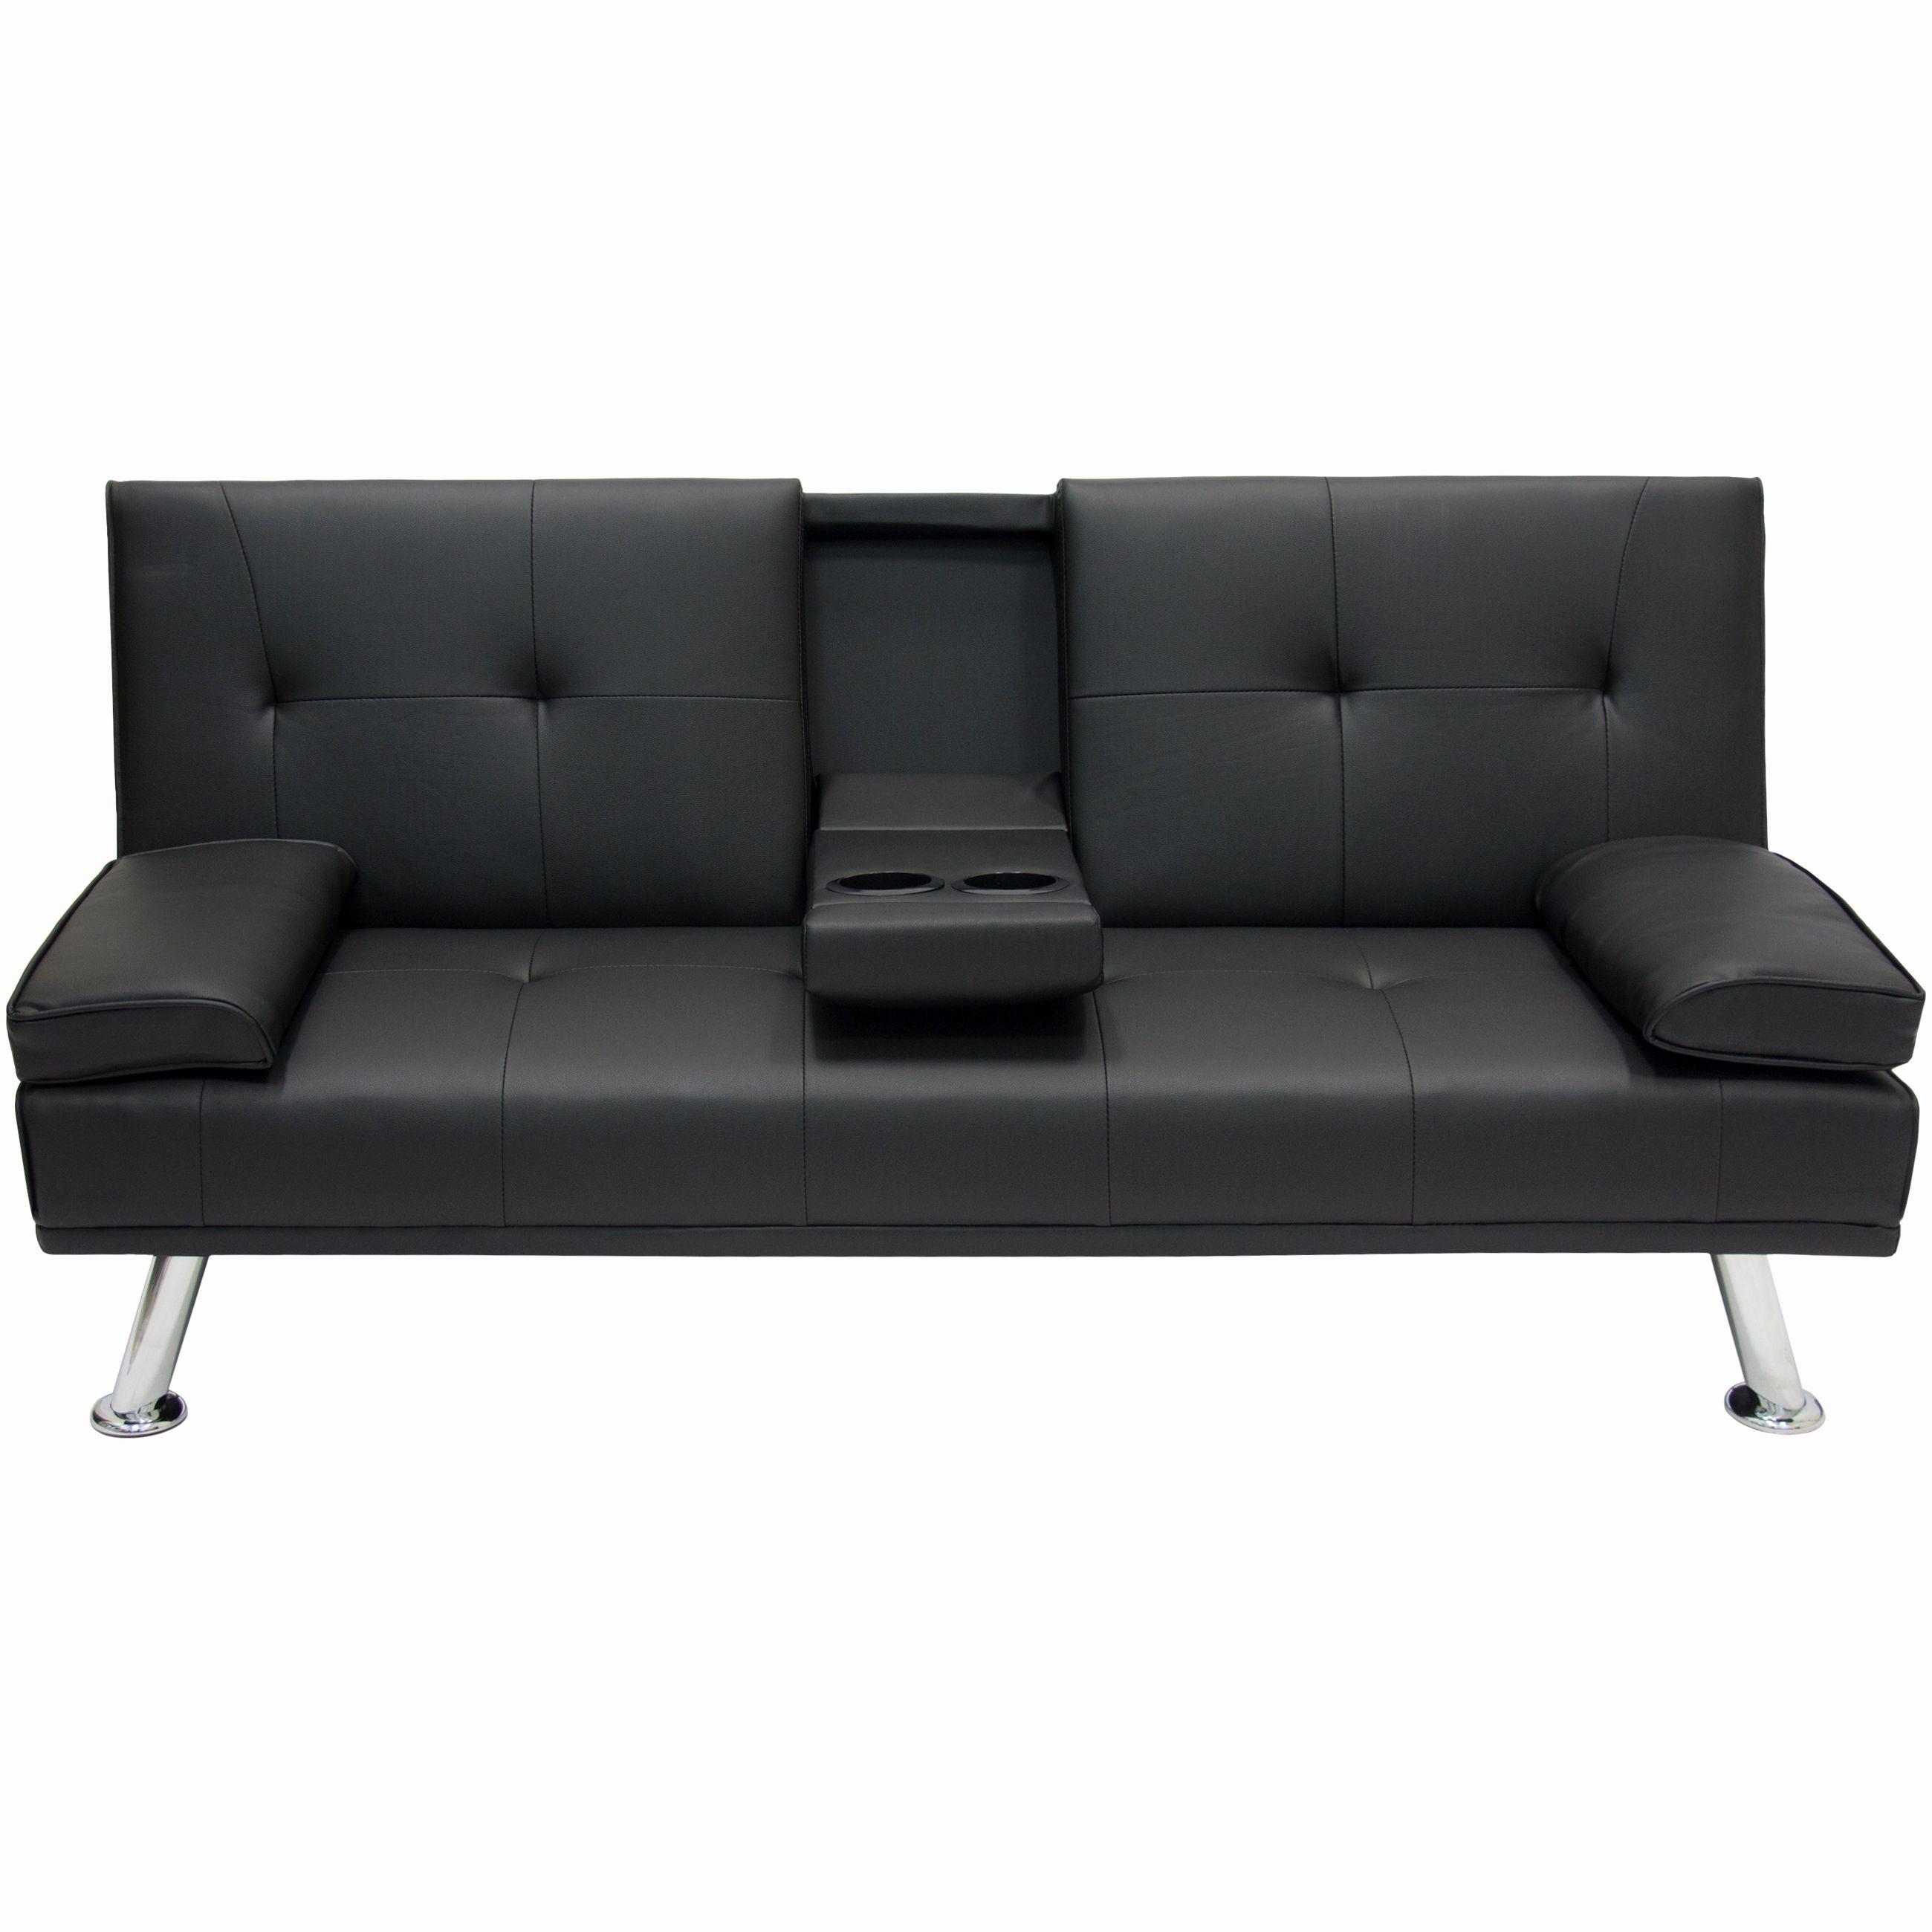 Luxury High Quality Sectional Sofa Graphics High Quality Sectional Sofa  Best Of Futon High Quality Sleeper